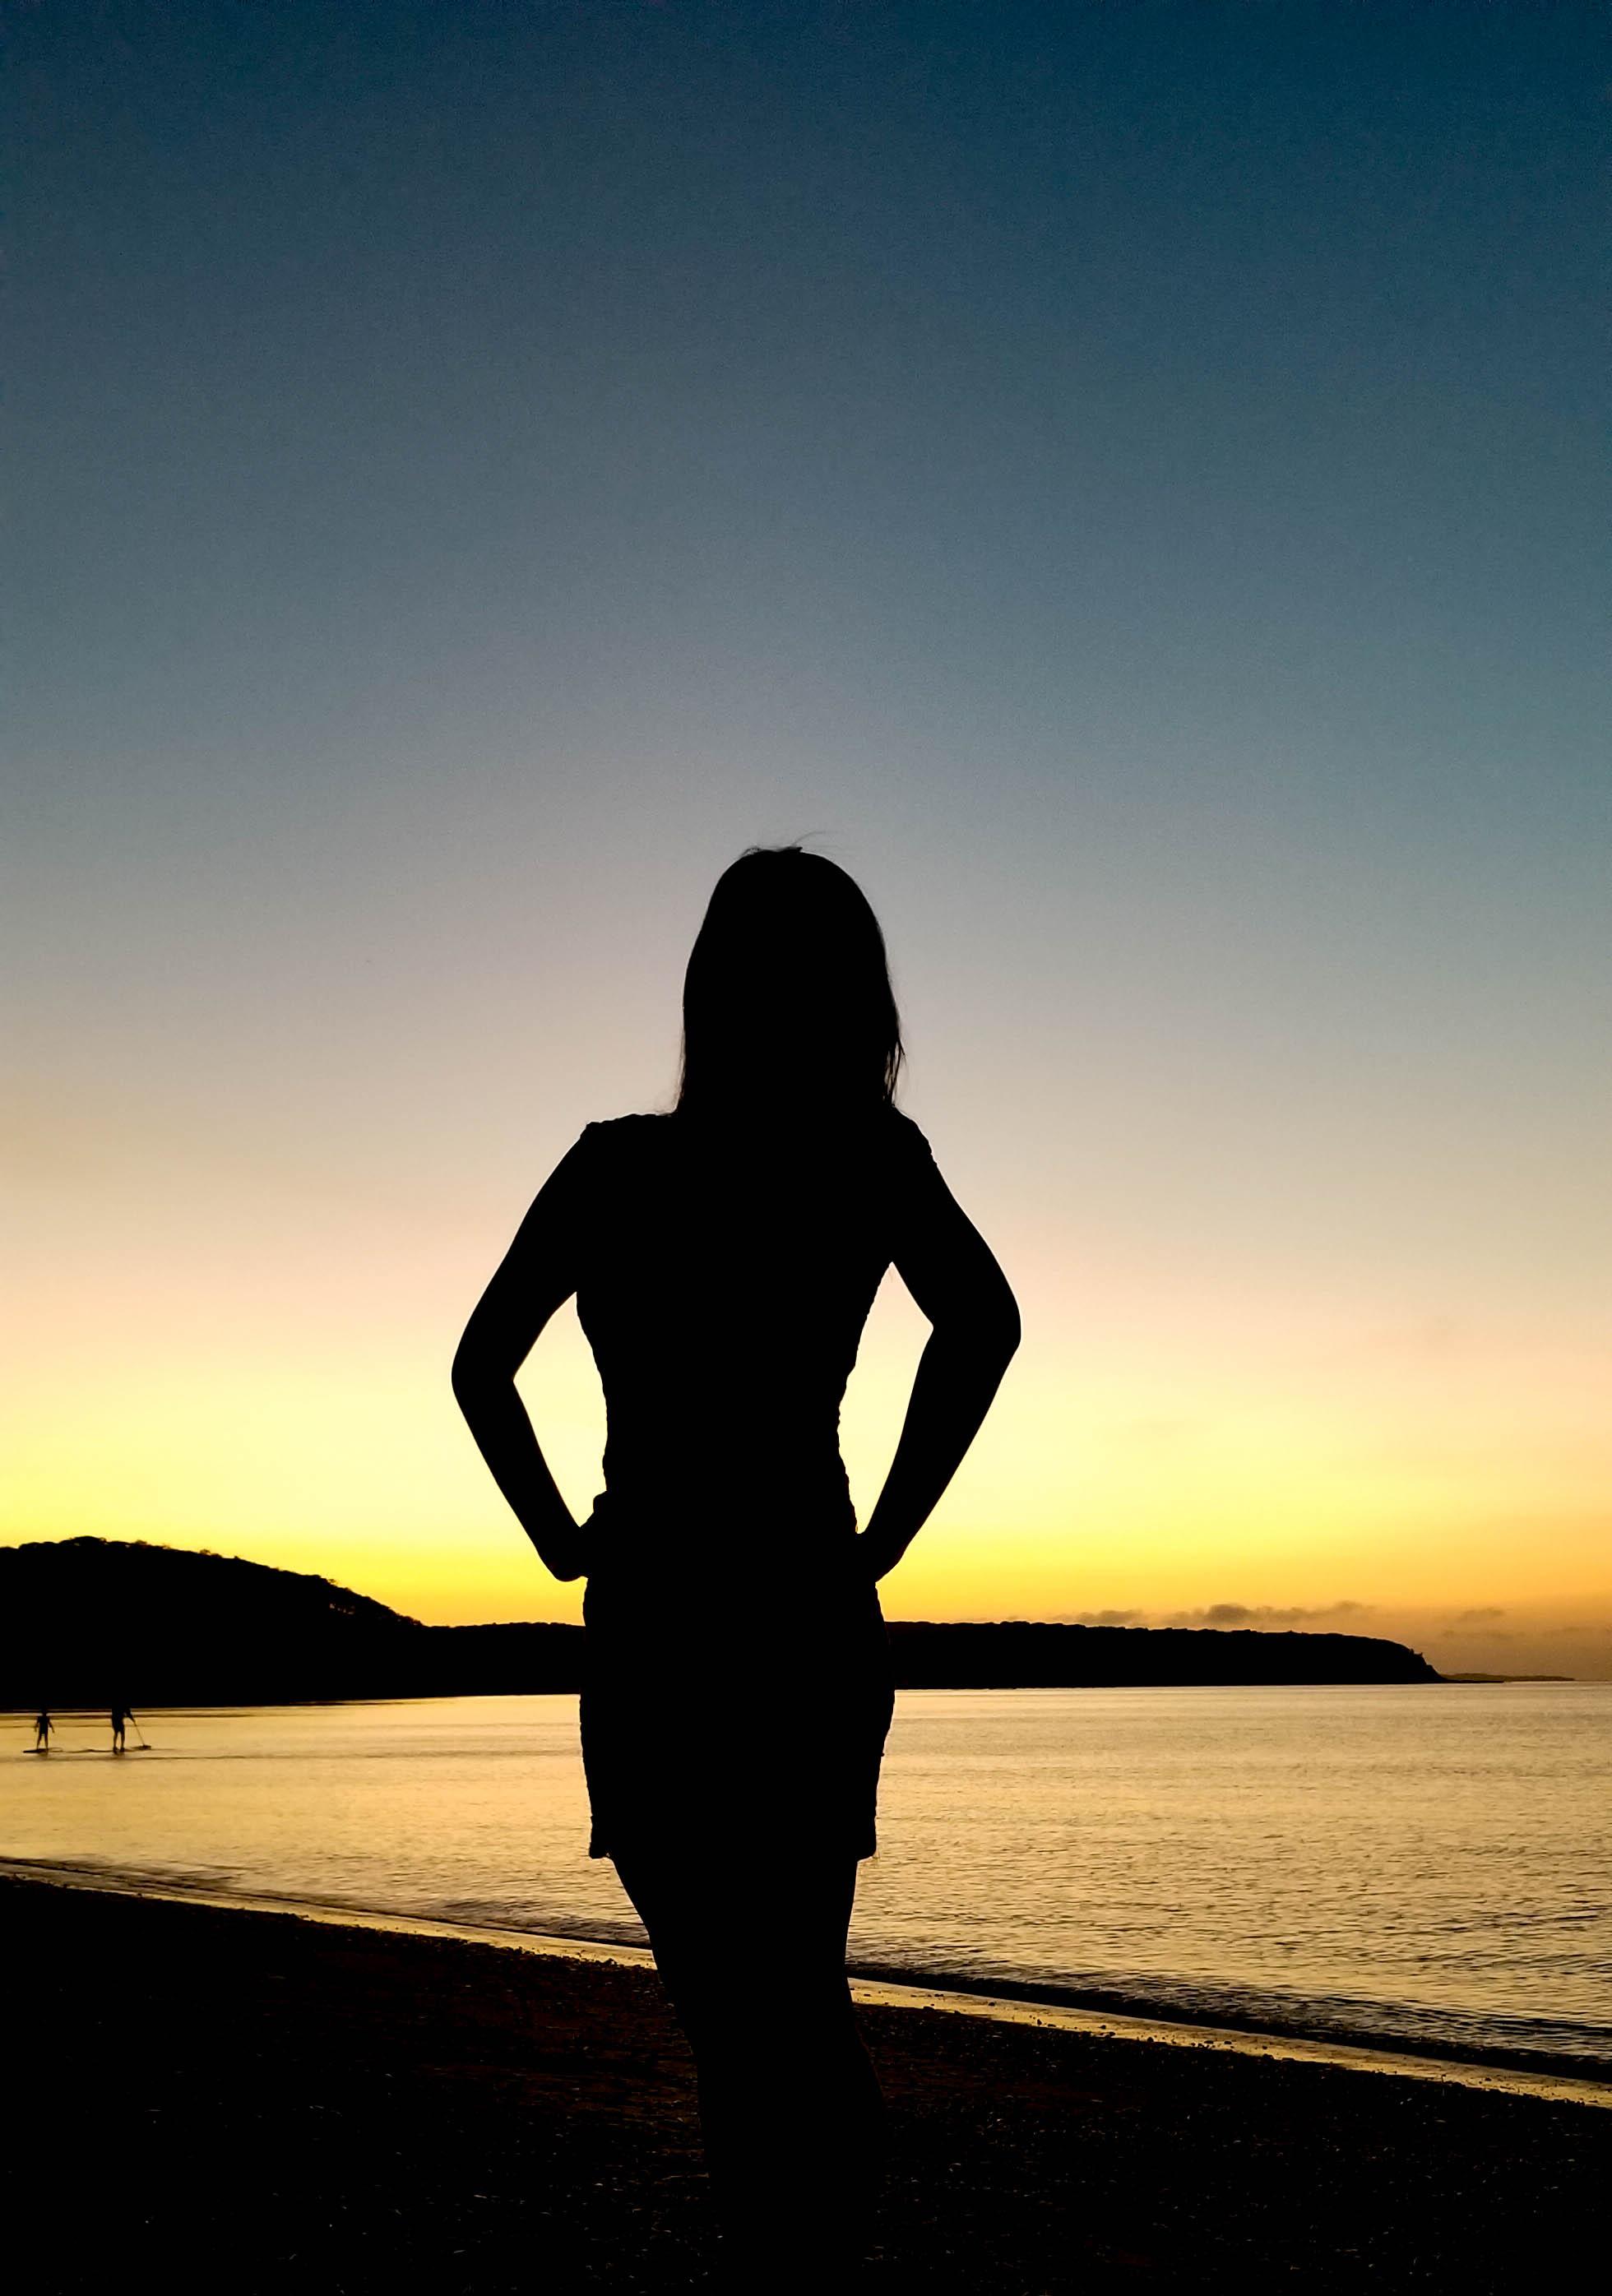 sunset at navy beach, montauk